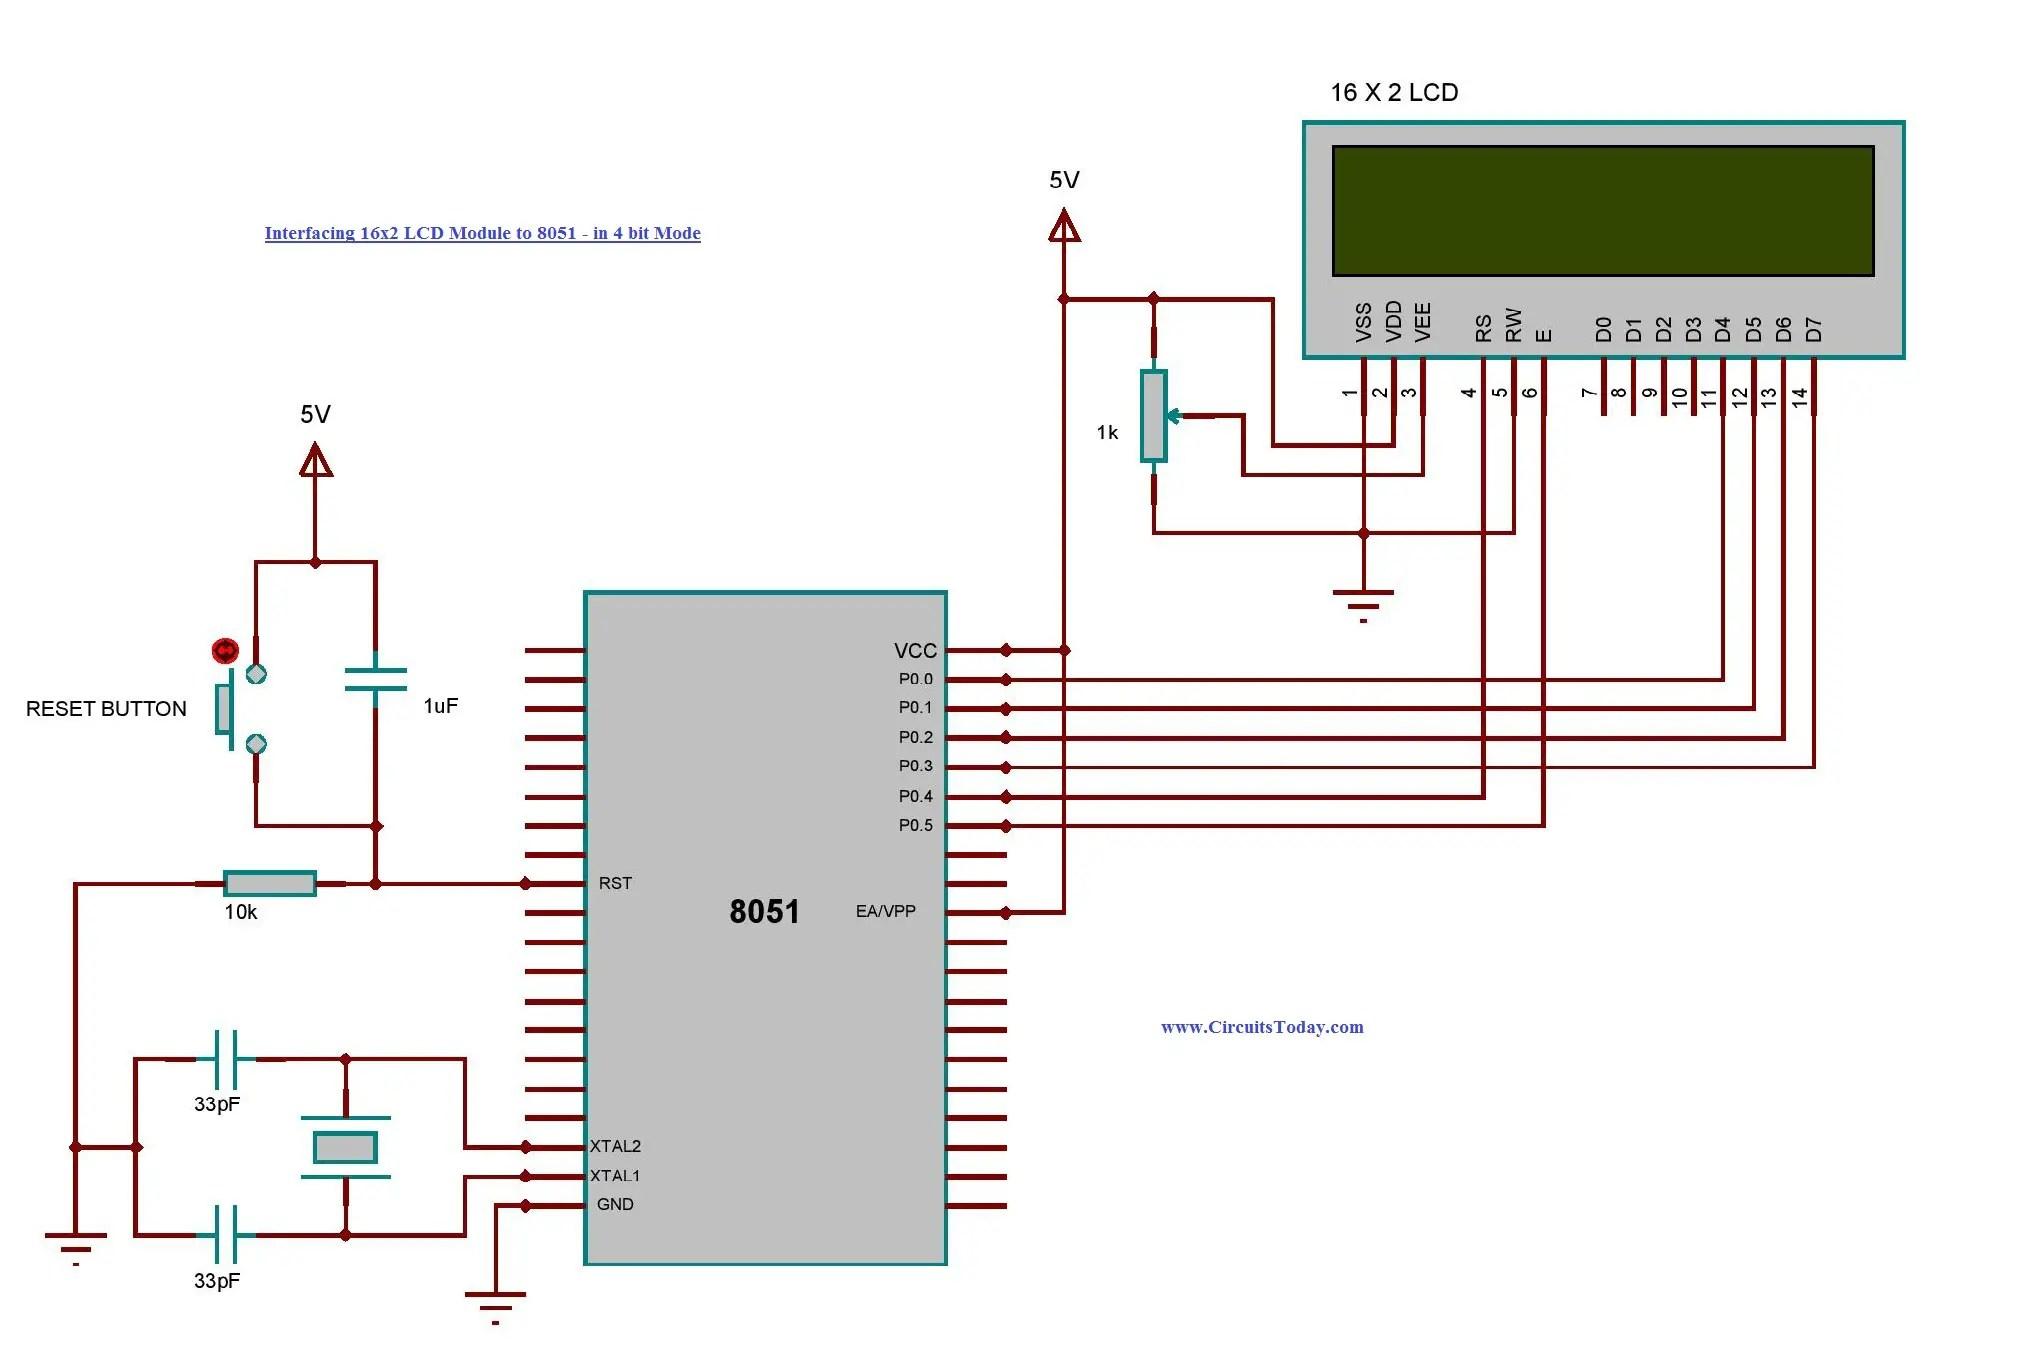 Block Diagram 16x2 Lcd 16x2 lcd commands lcd circuit diagram ... on arduino lcd wiring, 2x16 lcd wiring, 16x2 lcd-display pinout,